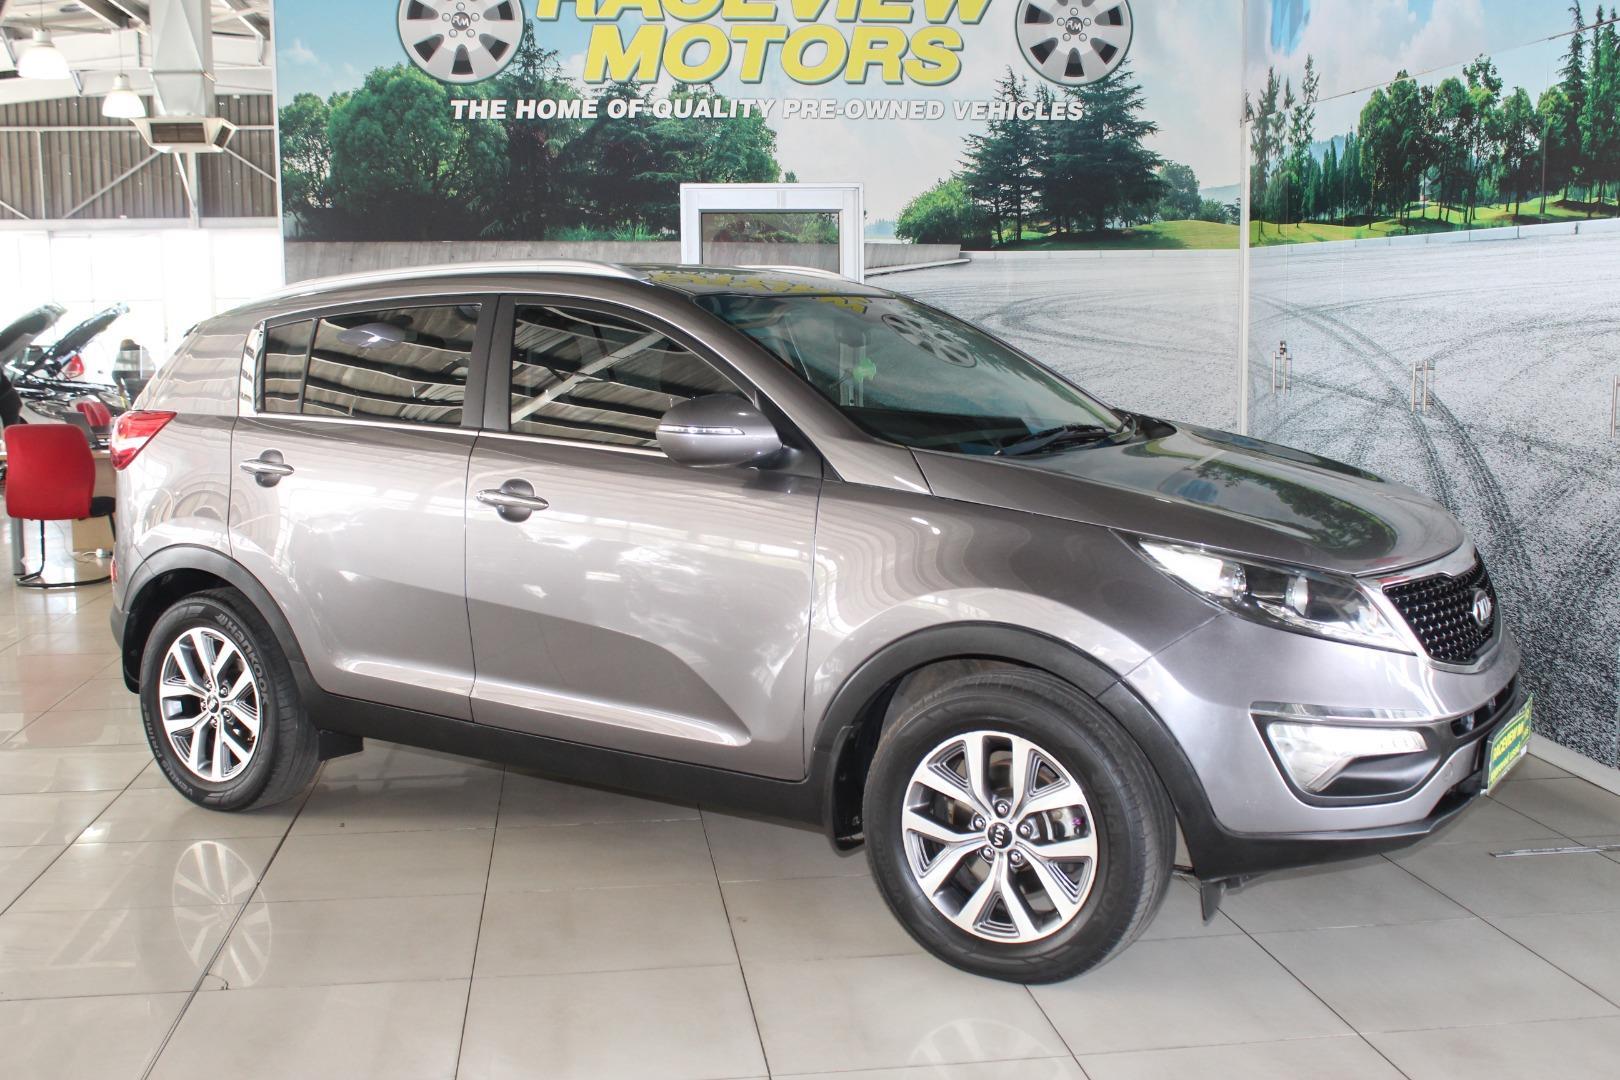 Kia Sportage - 2014 - 2.0 Auto